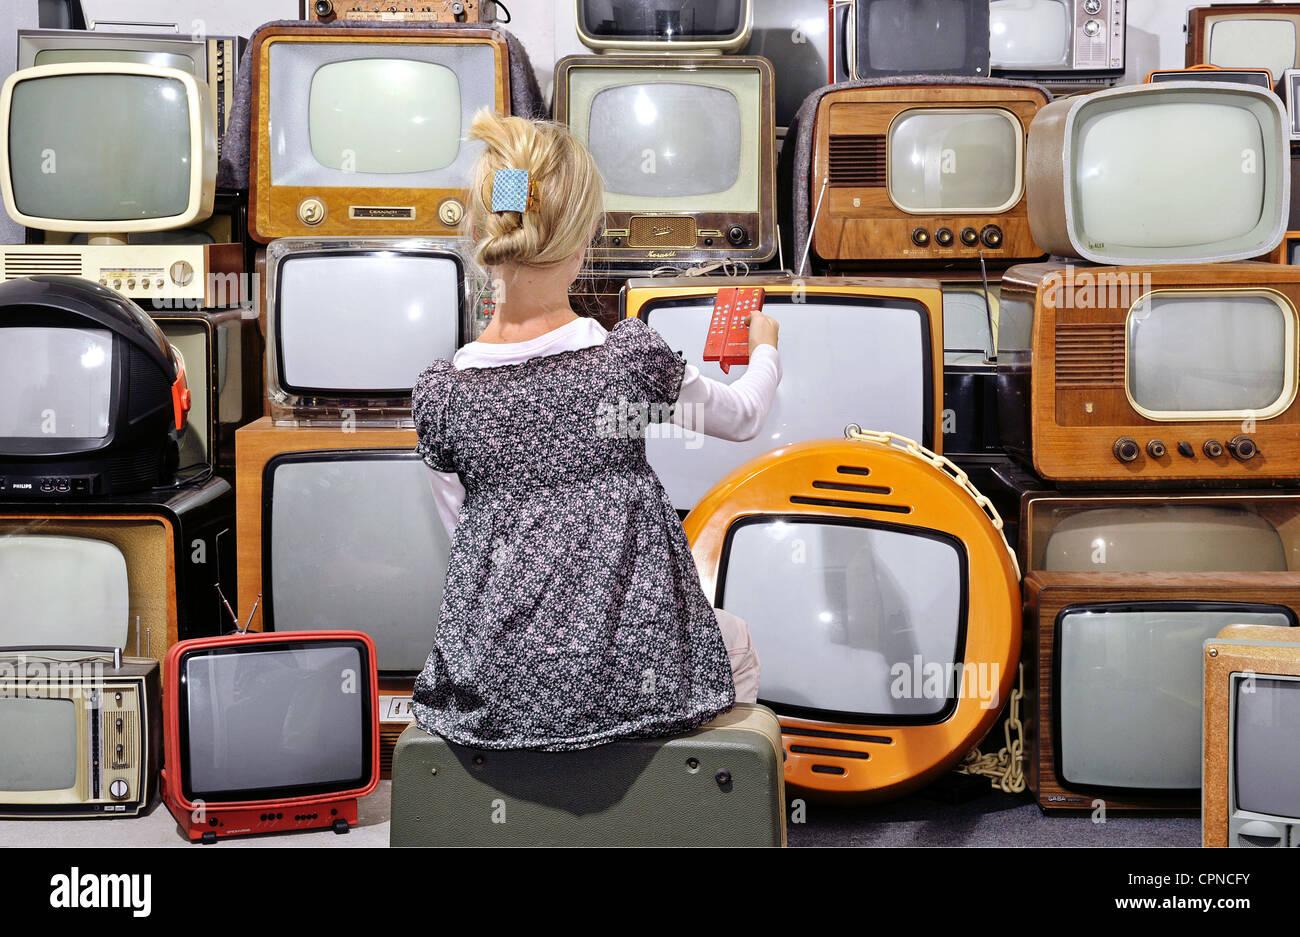 Broadcast television girl with television sets of the 50s years broadcast television girl with television sets of the 50s years up to 70s years symbol image germany children child kids buycottarizona